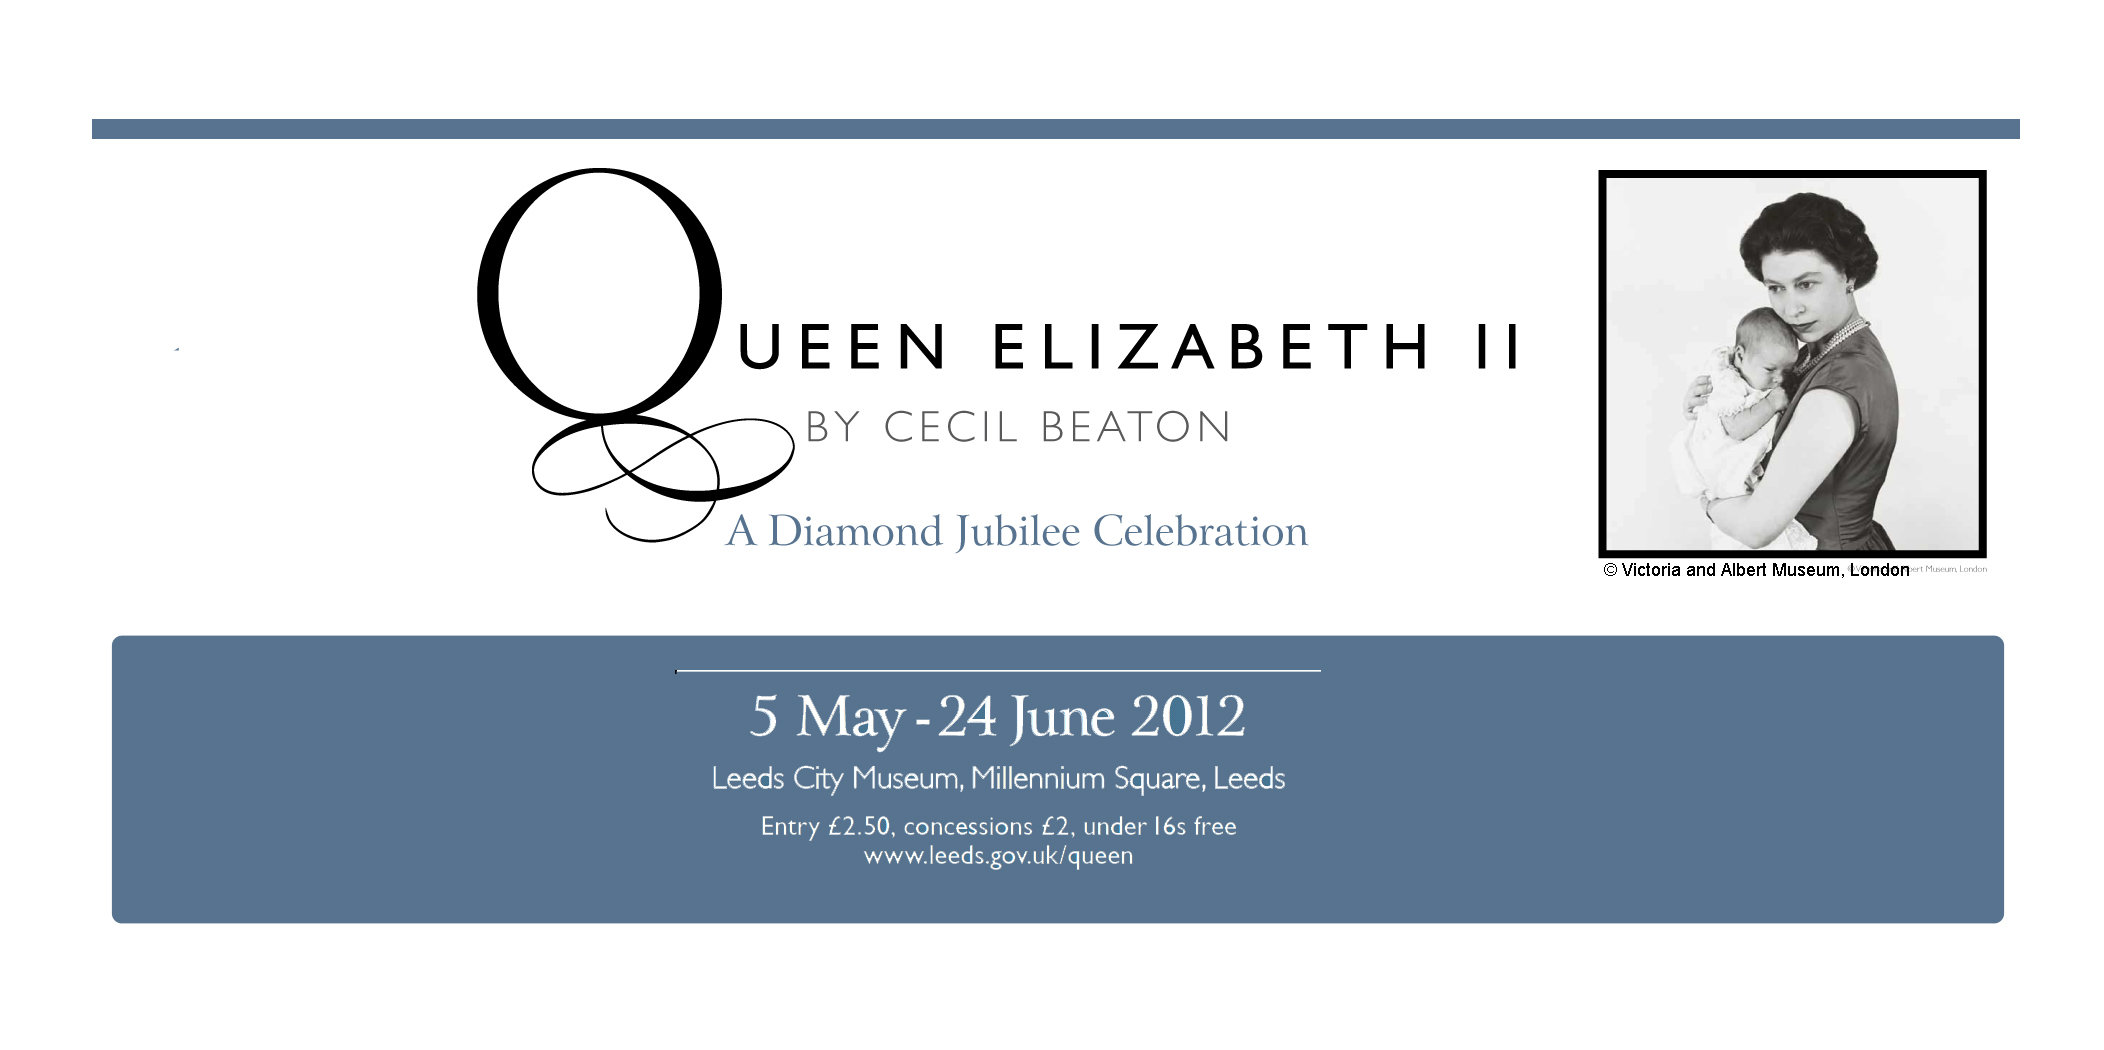 Queen Elizabeth II by Cecil Beaton at Leeds City Museum